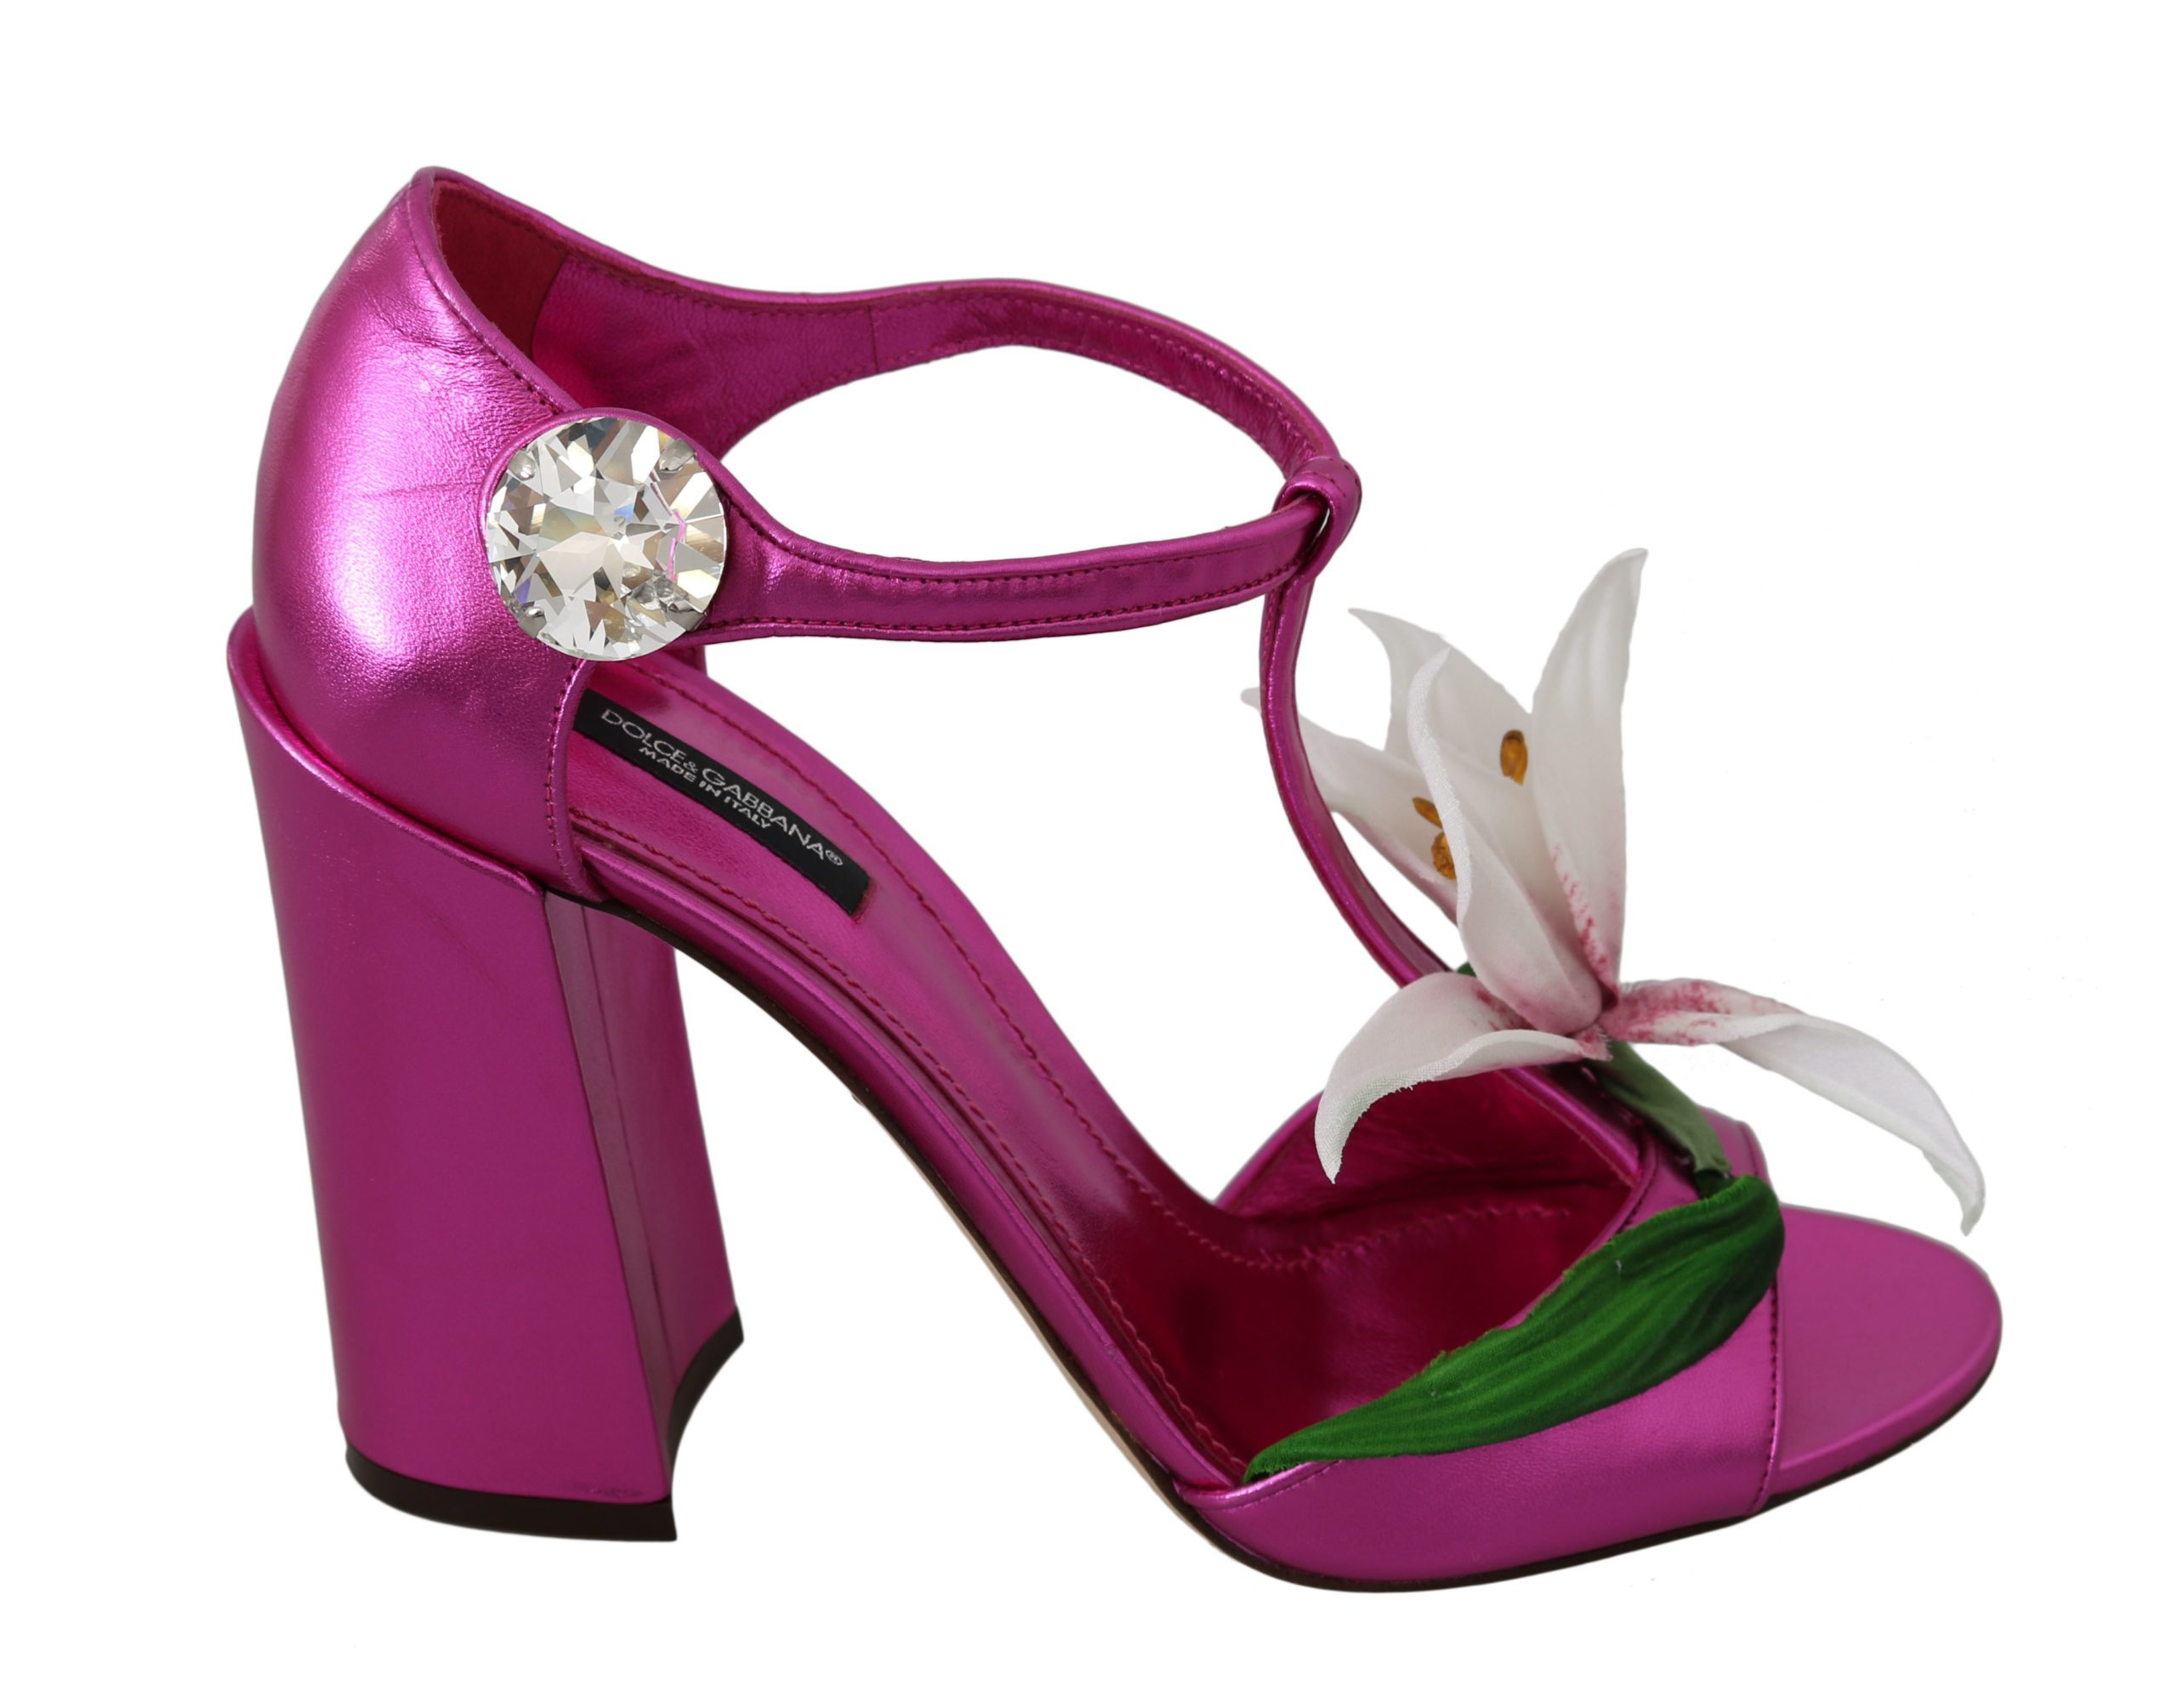 Dolce & Gabbana Women's Leather Floral Crystal Sandals Pink LA7446 - EU40/US9.5